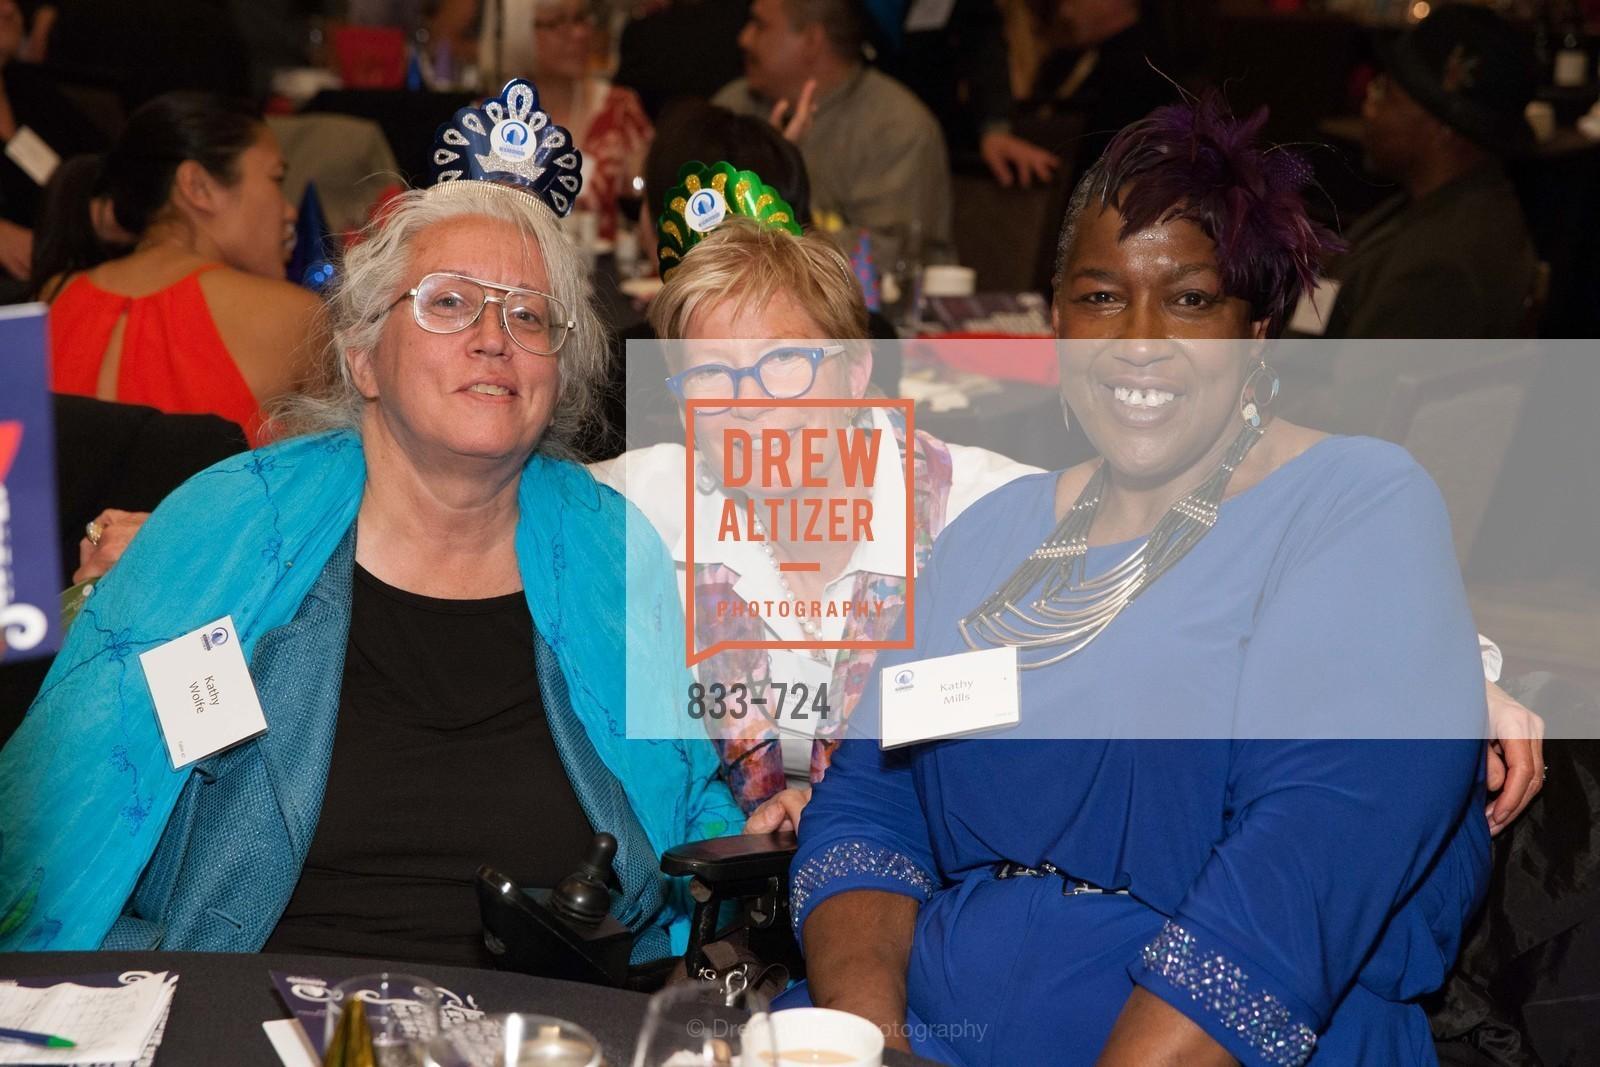 Kathy Wolfe, Loren Sanborn, Kethy Mills, TNDC's 34th Annual Birthday Dinner, US, May 12th, 2015,Drew Altizer, Drew Altizer Photography, full-service agency, private events, San Francisco photographer, photographer california